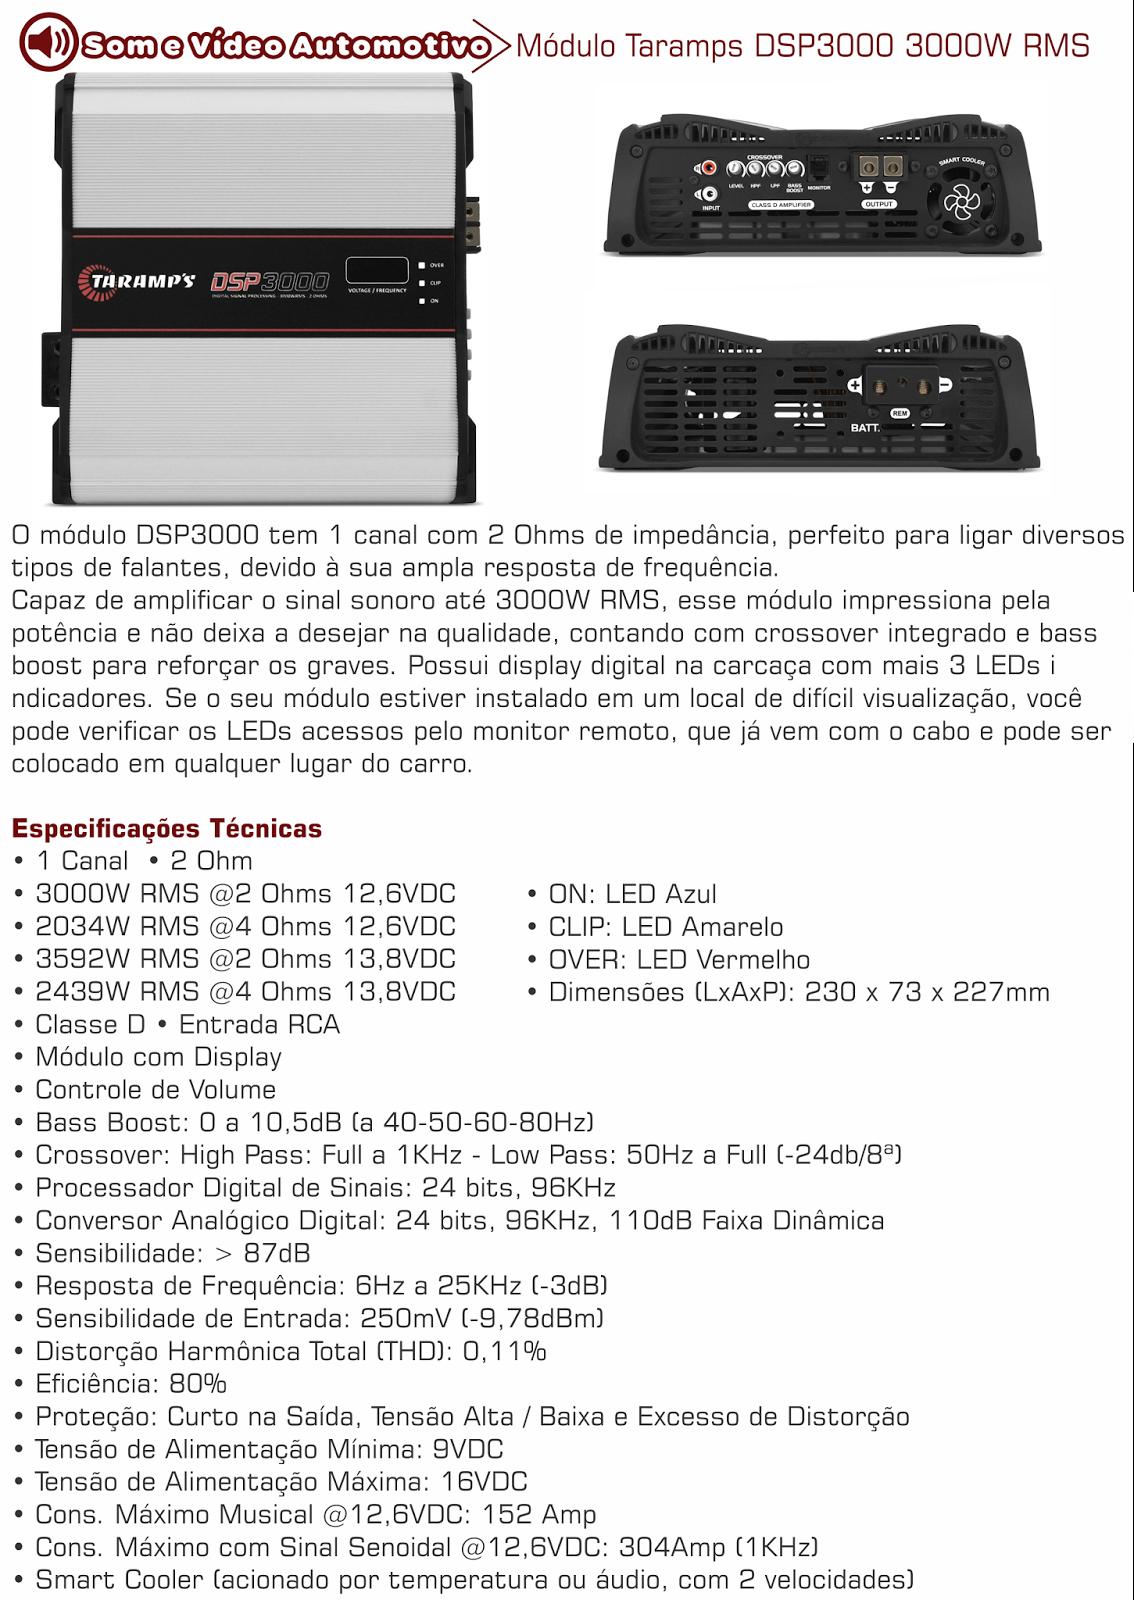 modulo taramps dsp 3000w rms digital barra potencia 2 ohms. Black Bedroom Furniture Sets. Home Design Ideas